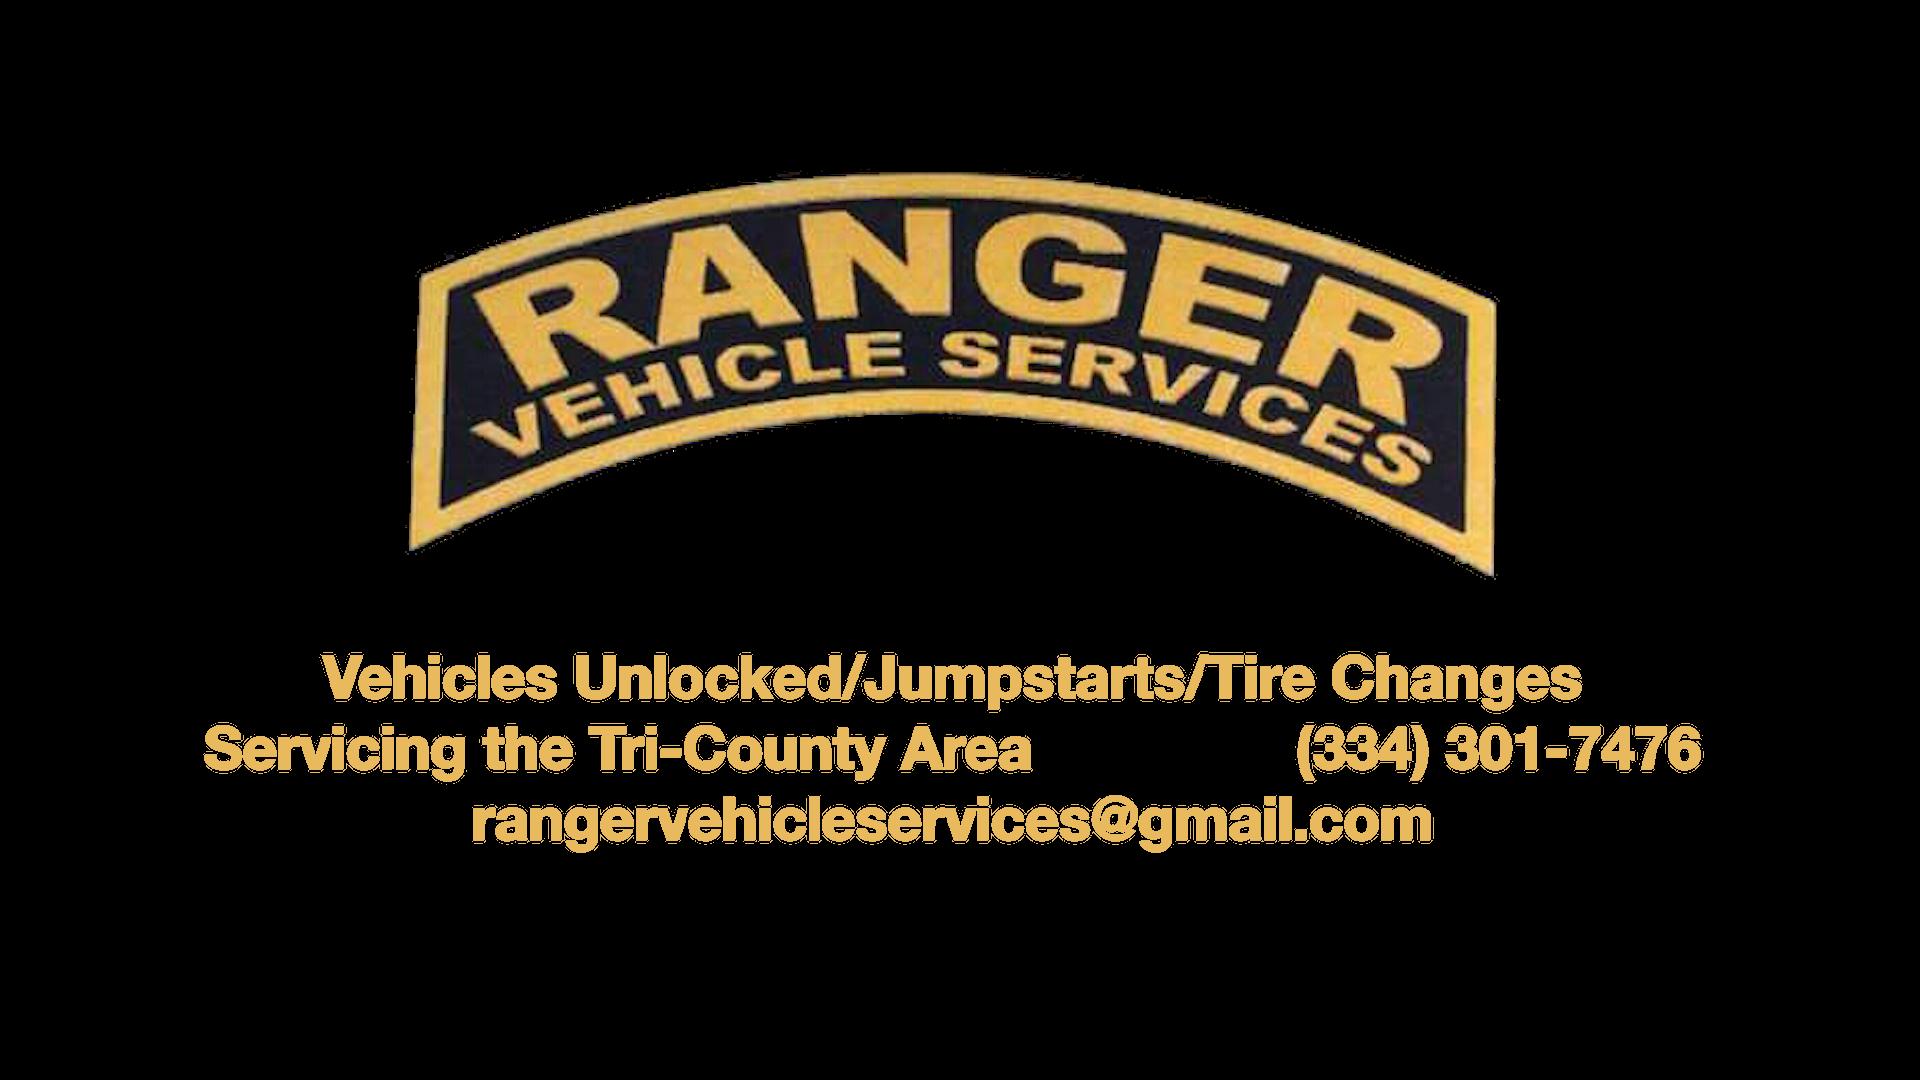 RANGER VEHICLE SERVICES LOGO00